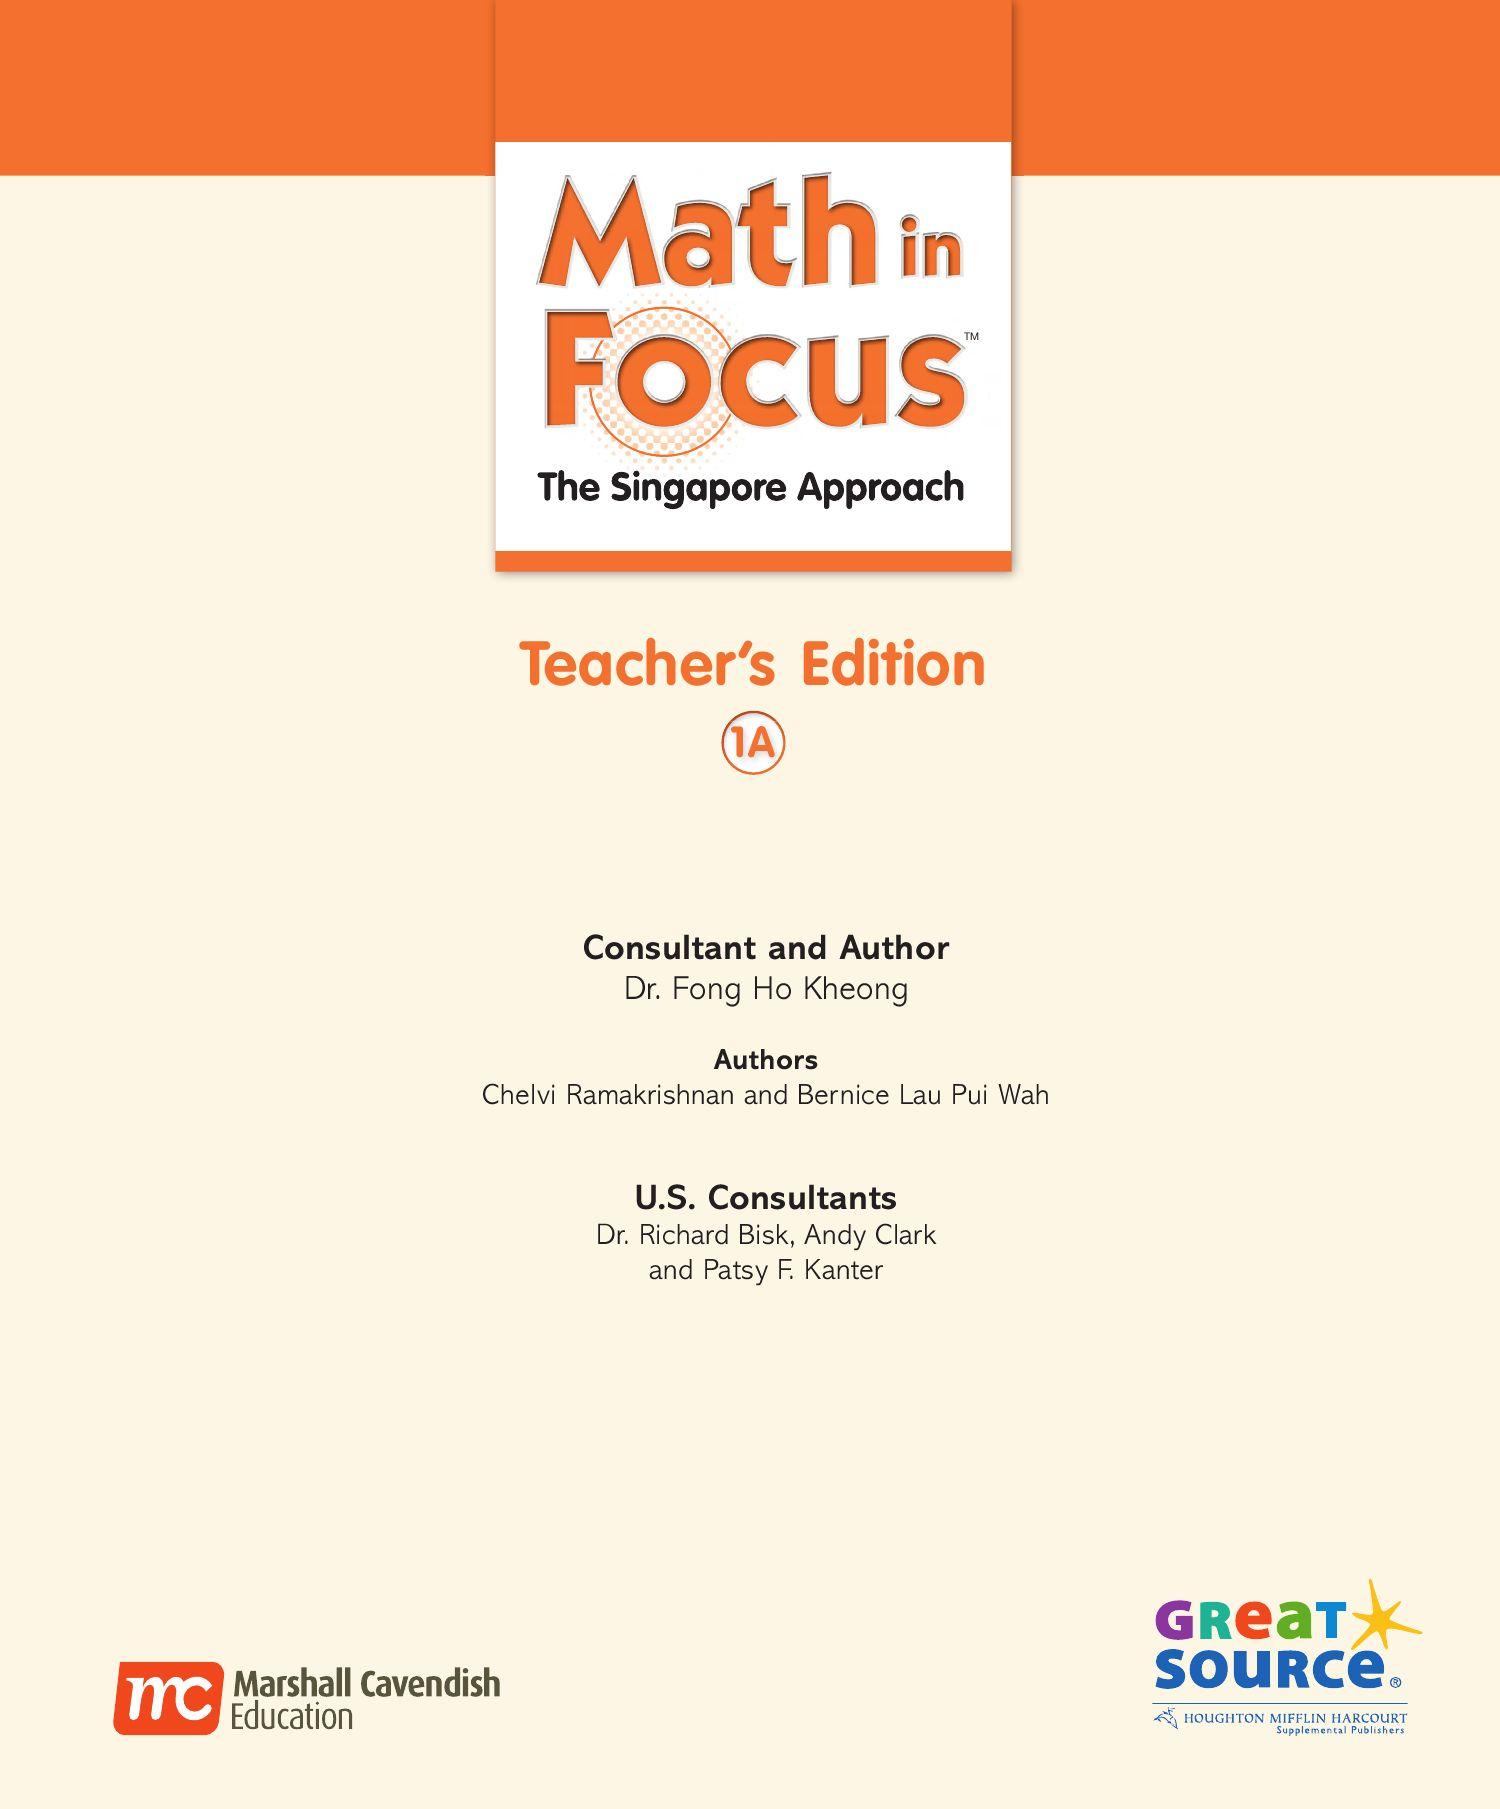 math worksheet : what is a metaphor math worksheet page 221  educational math  : What Is A Metaphor Math Worksheet